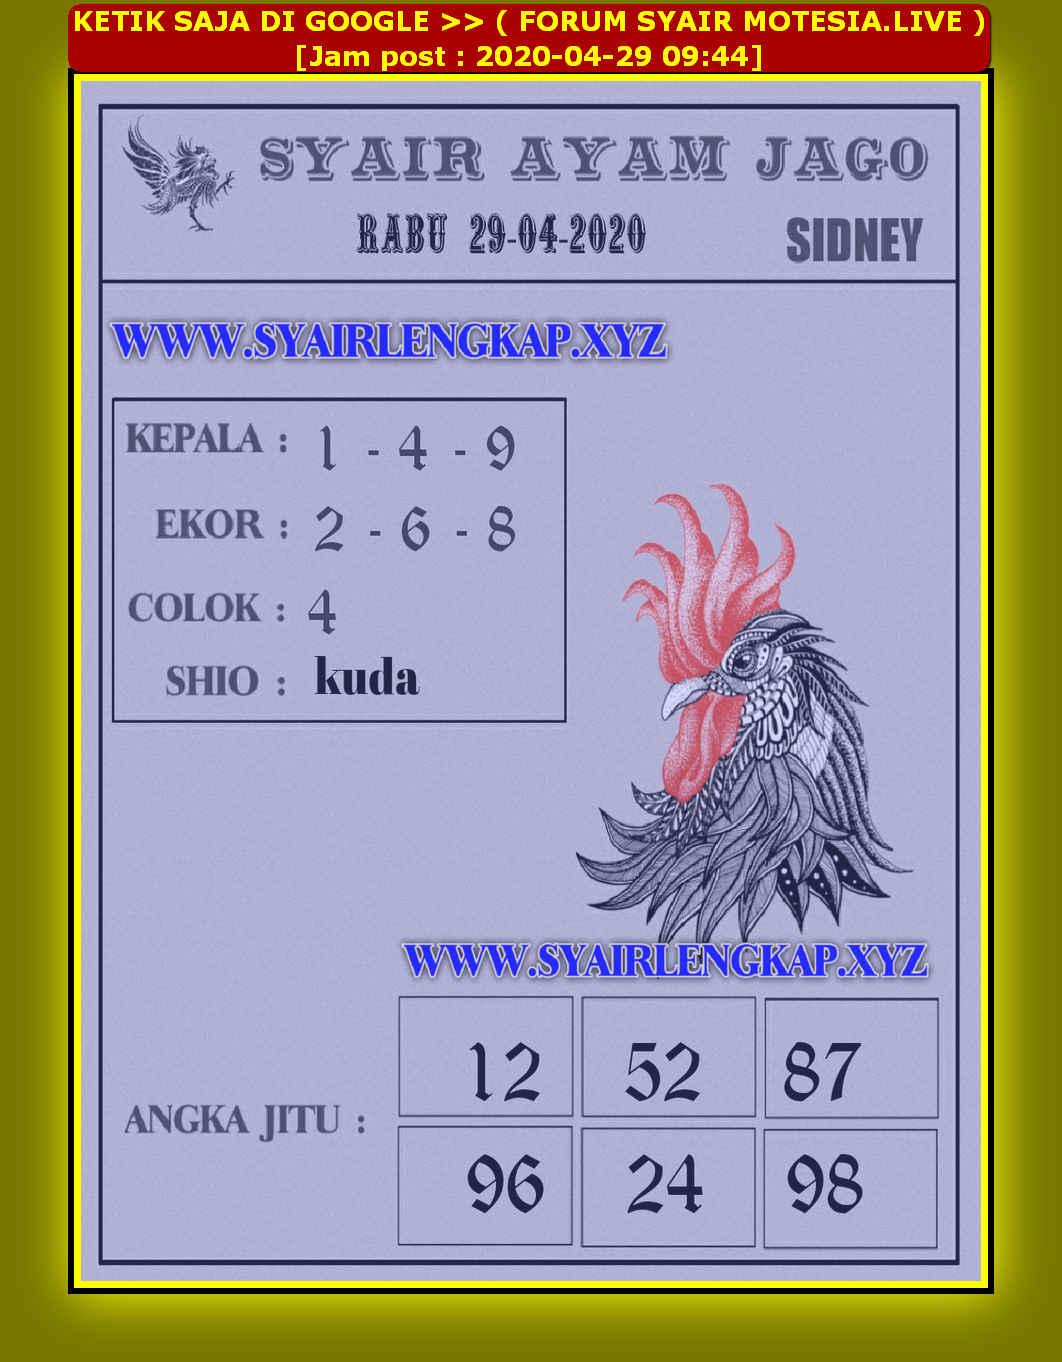 Kode syair Sydney Rabu 29 April 2020 113